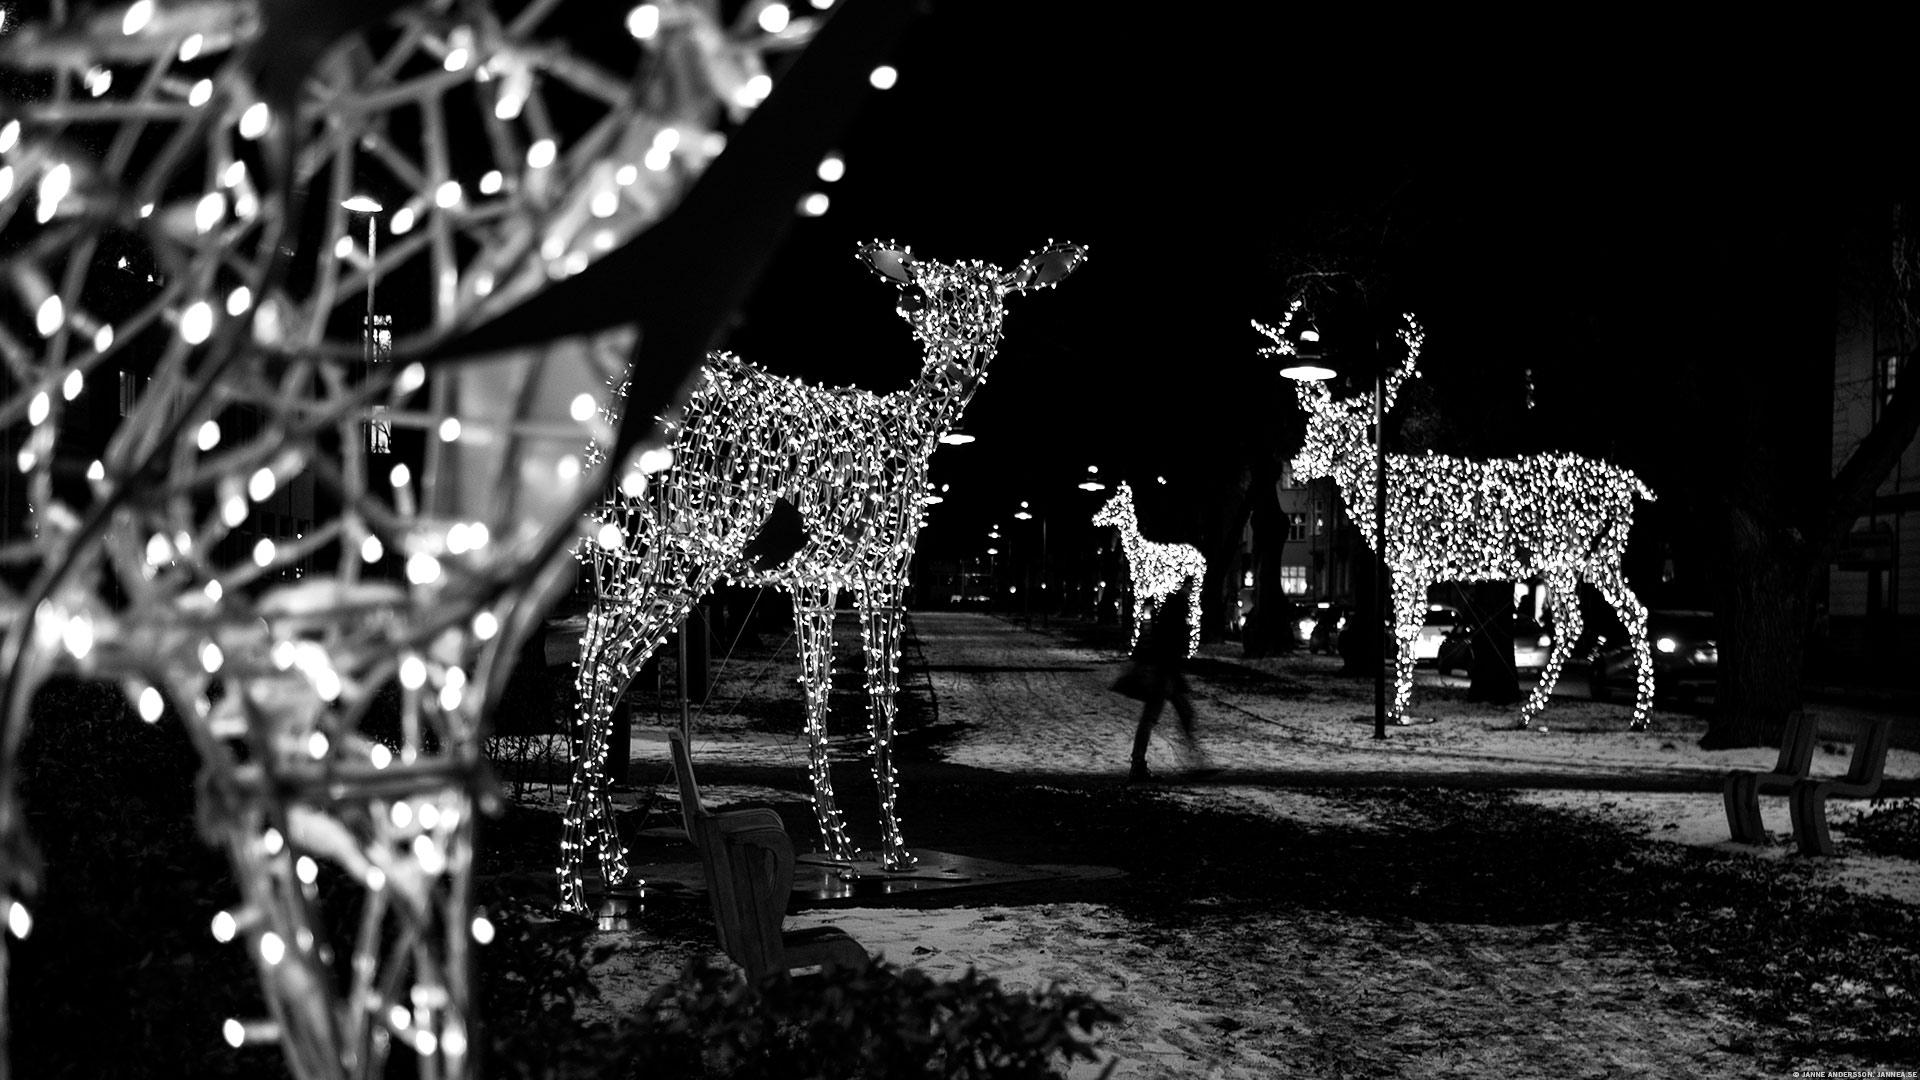 Vinterstad i ljus, Linköping|© Janne A